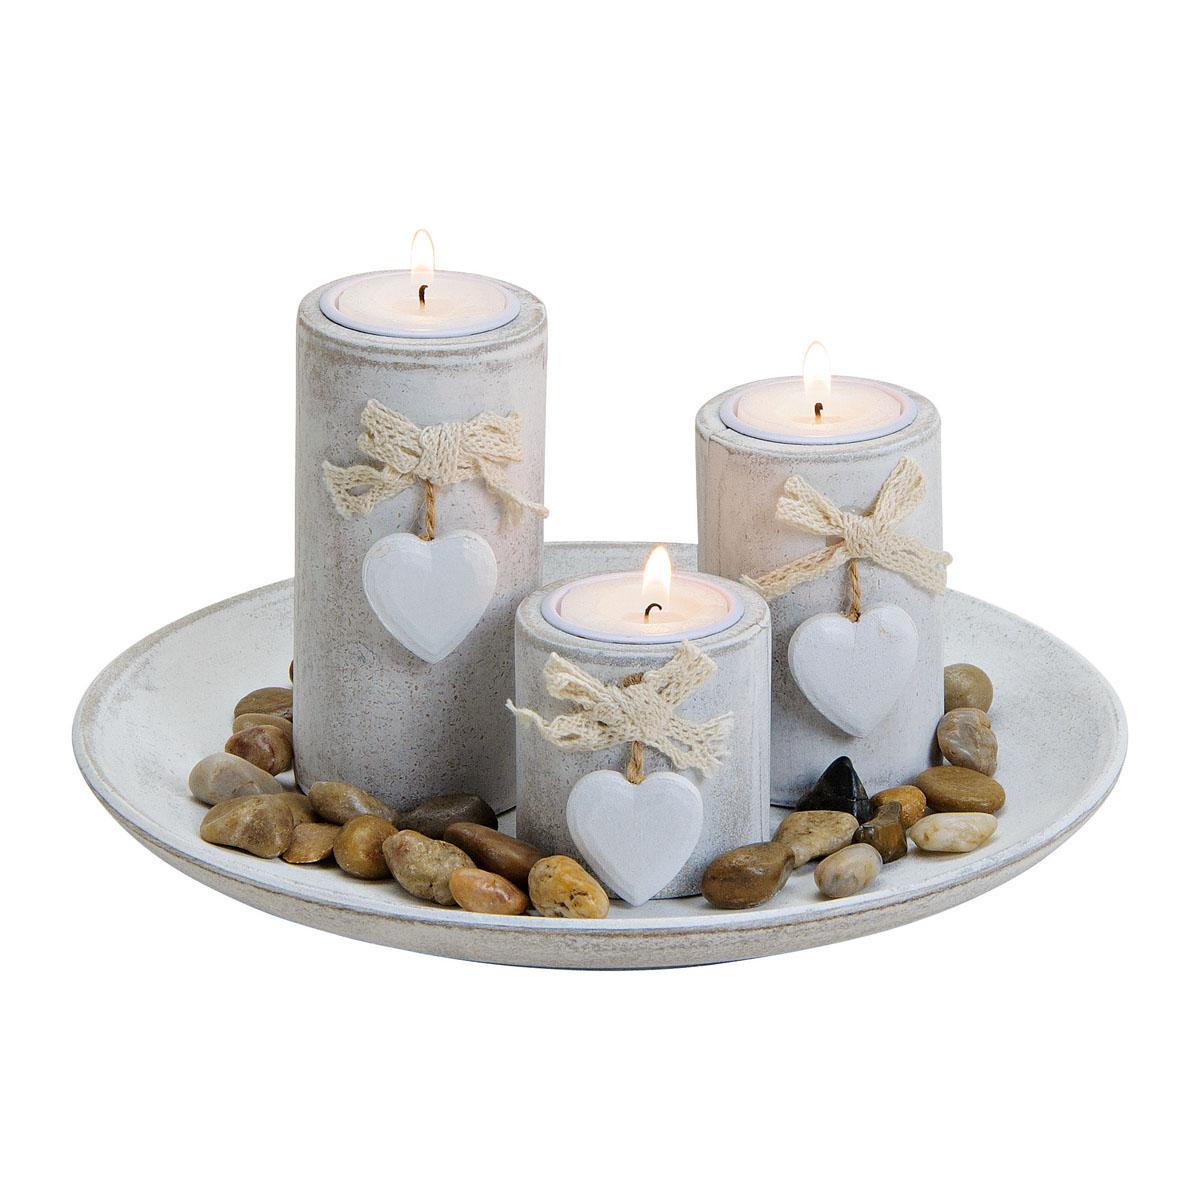 "Подсвечники на подносе с декором ""Сердечки"", на 3 свечи [08400],"